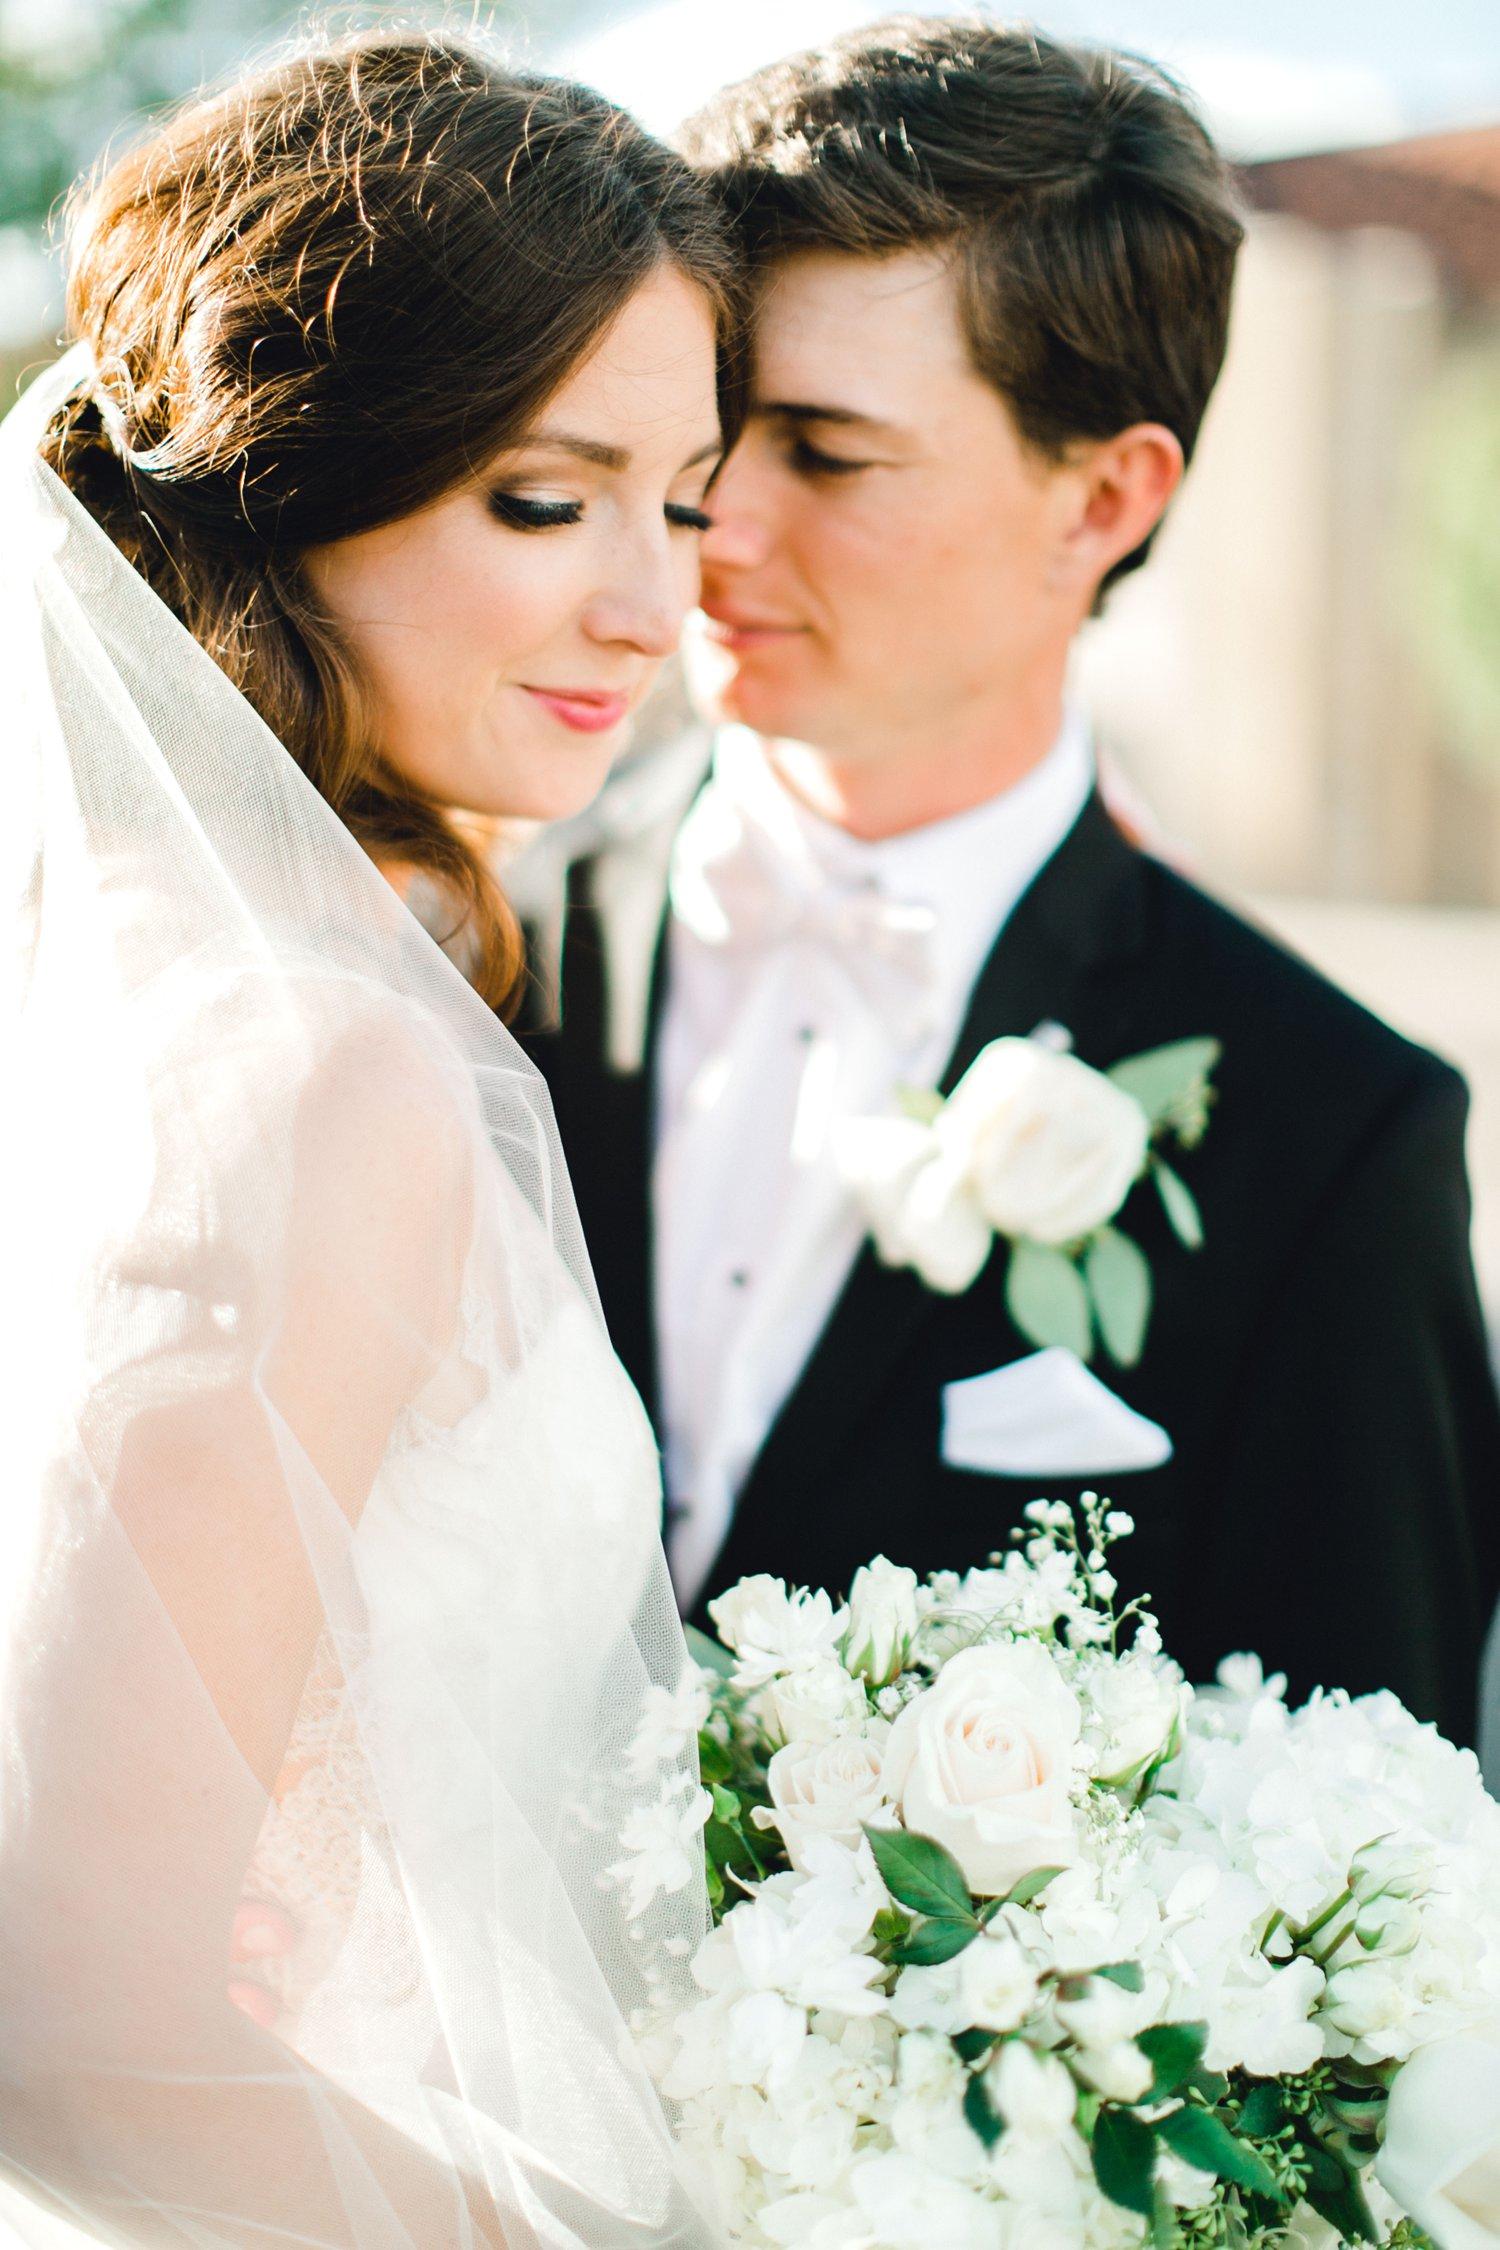 Hunter_and_Molly_Rawls_ALLEEJ_Lubbock_WEDDING_Legacy_Event_Center_0145.jpg